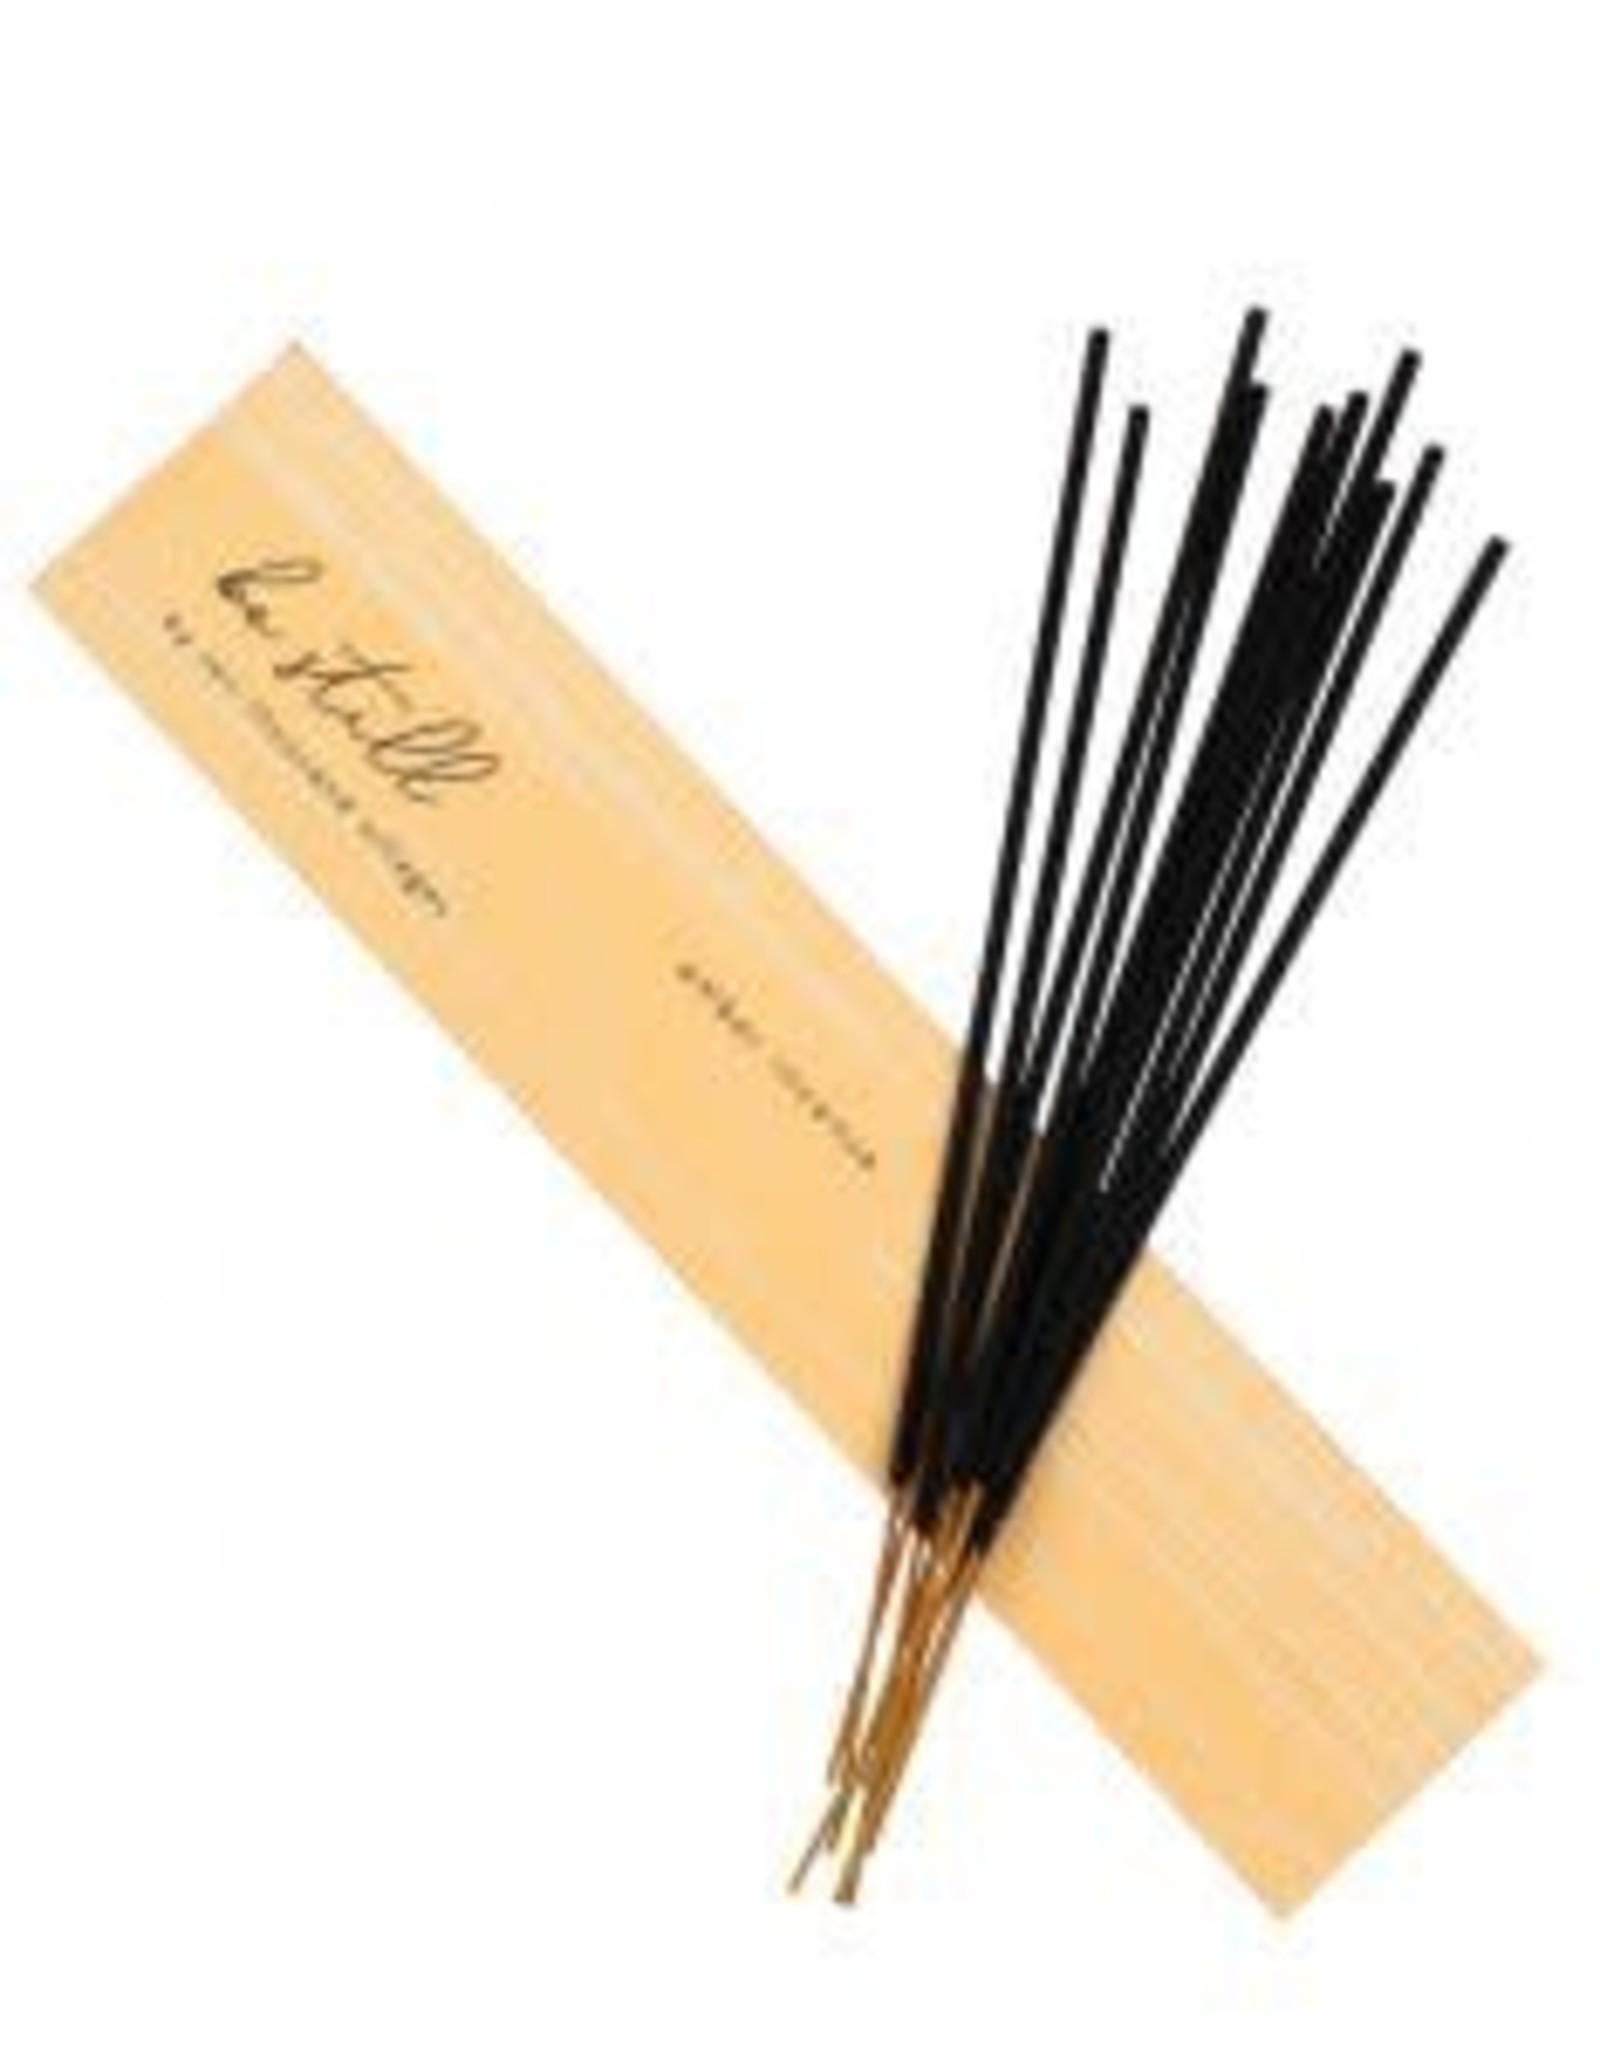 feb19 India, Stick Incense Amber